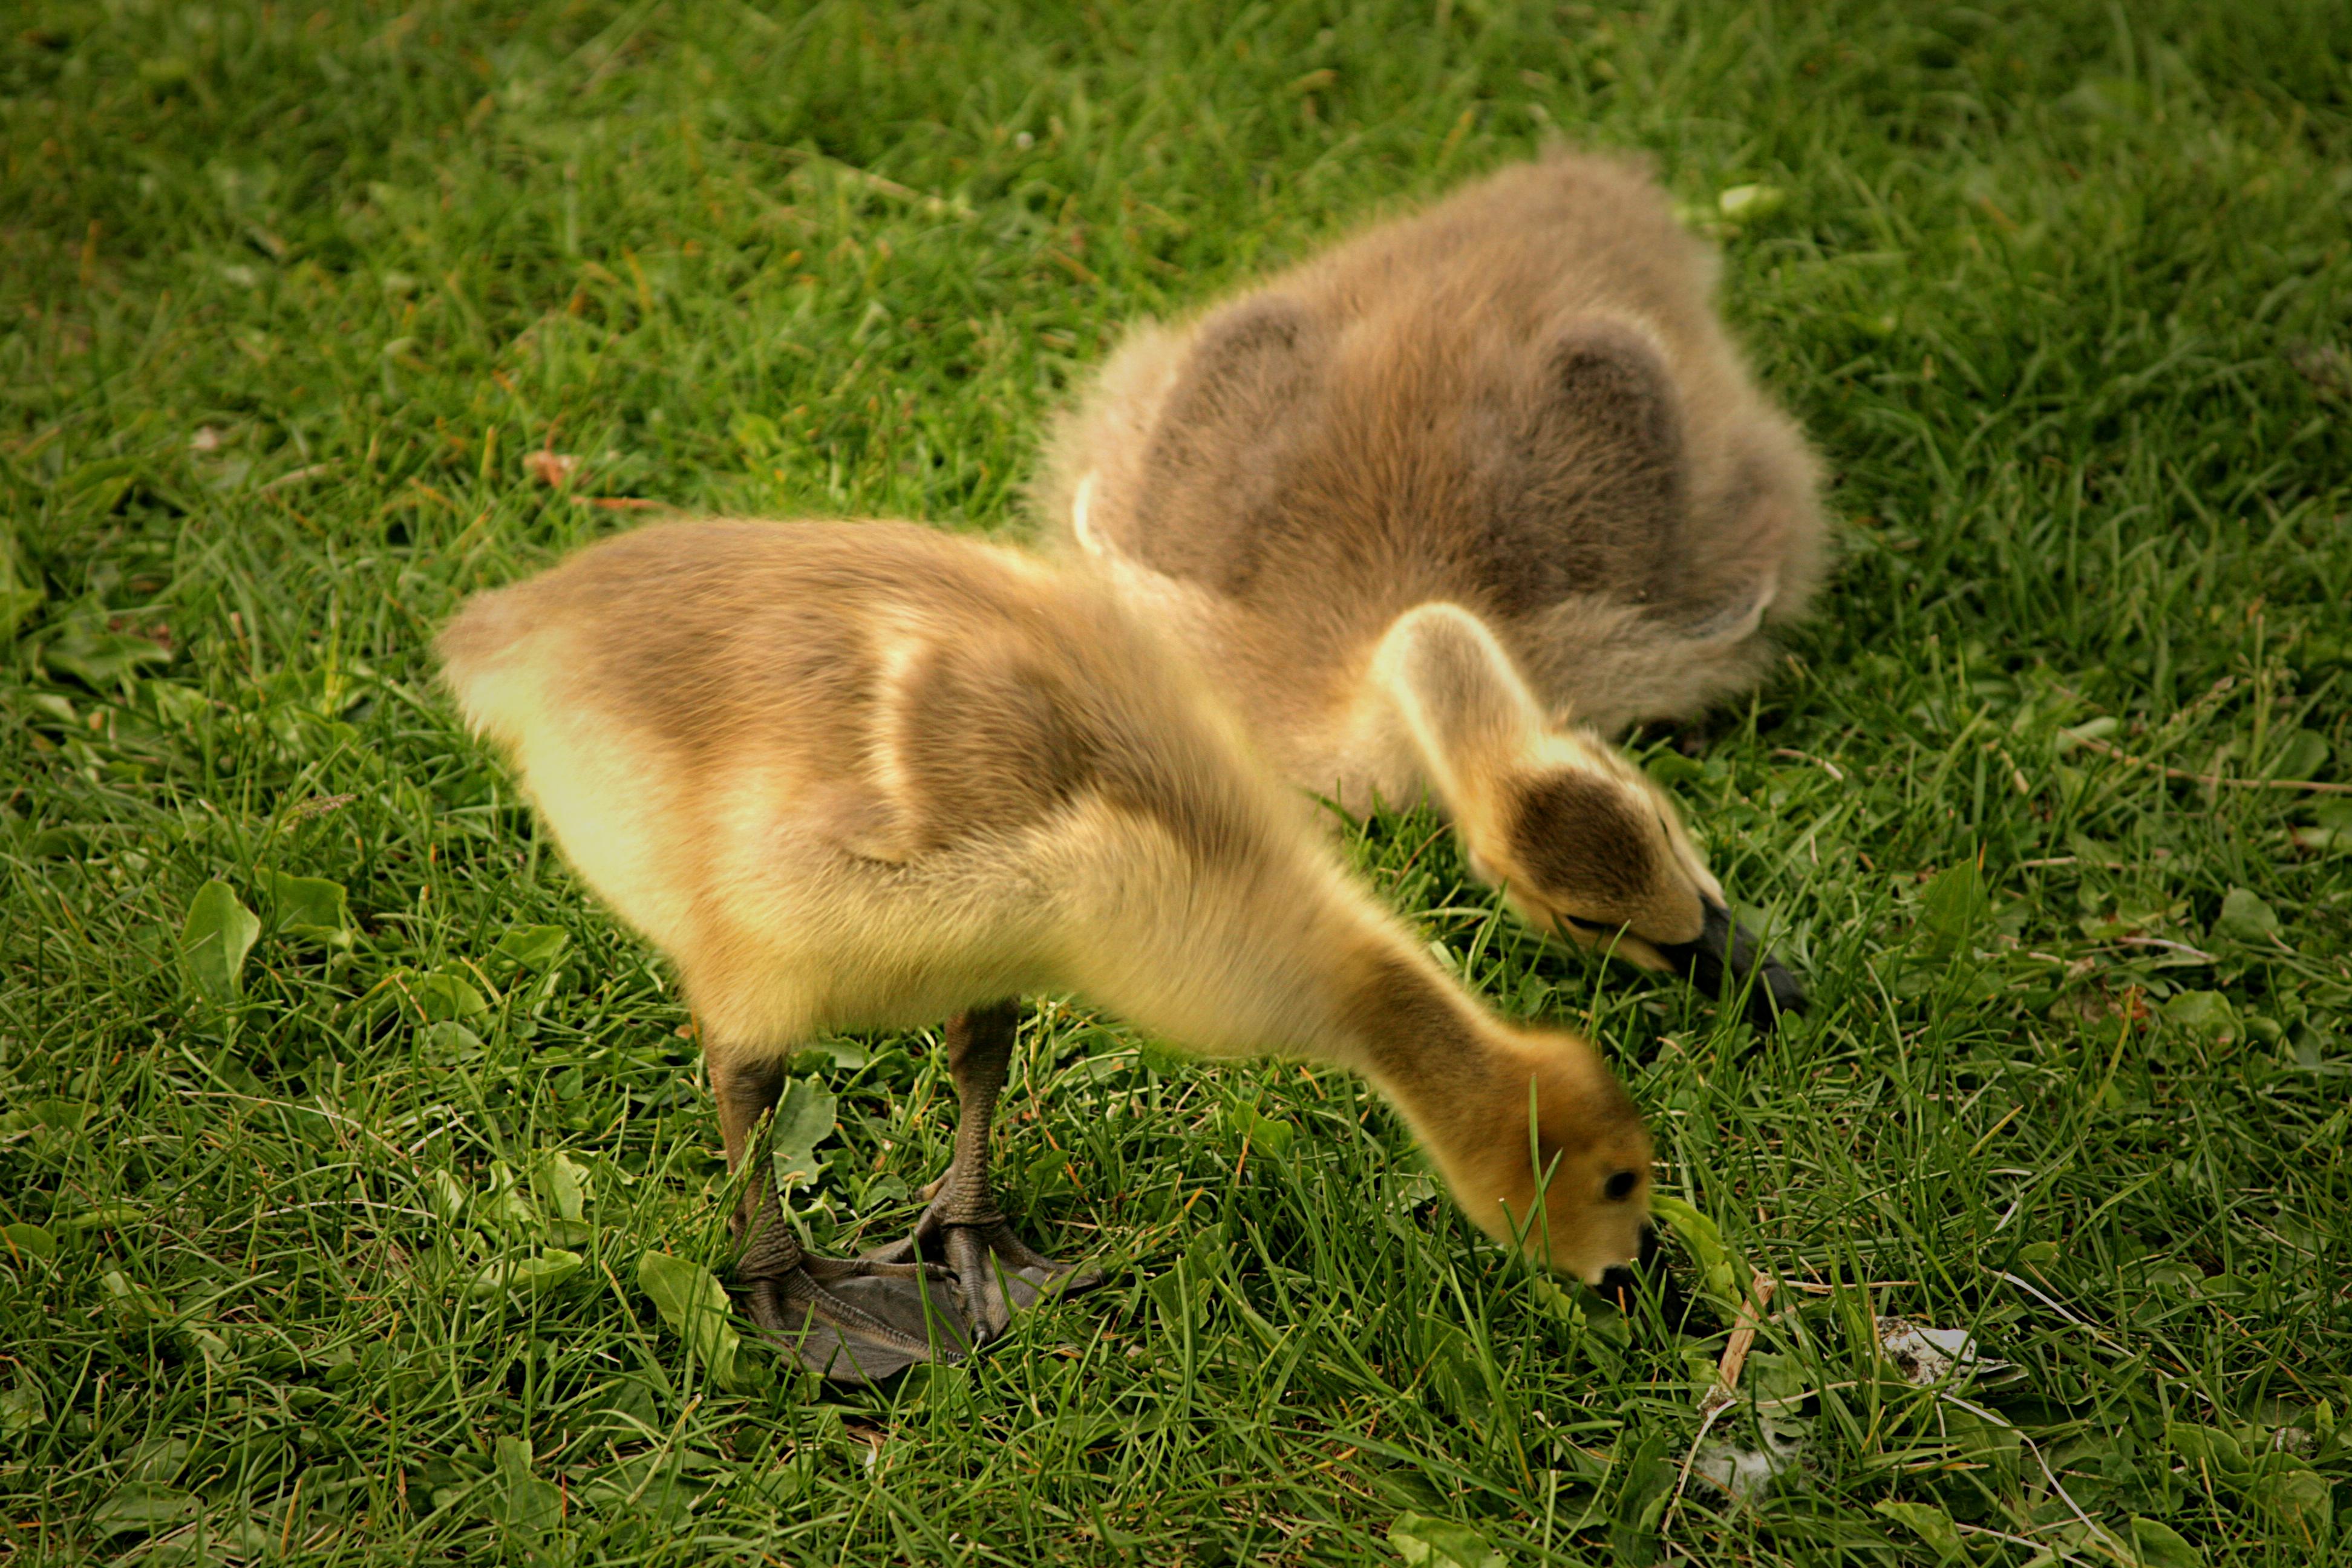 Canada Goose goslings in Hawrelak Park, Edmonton, Alberta, Canada. Photo taken on June 6, 2013.